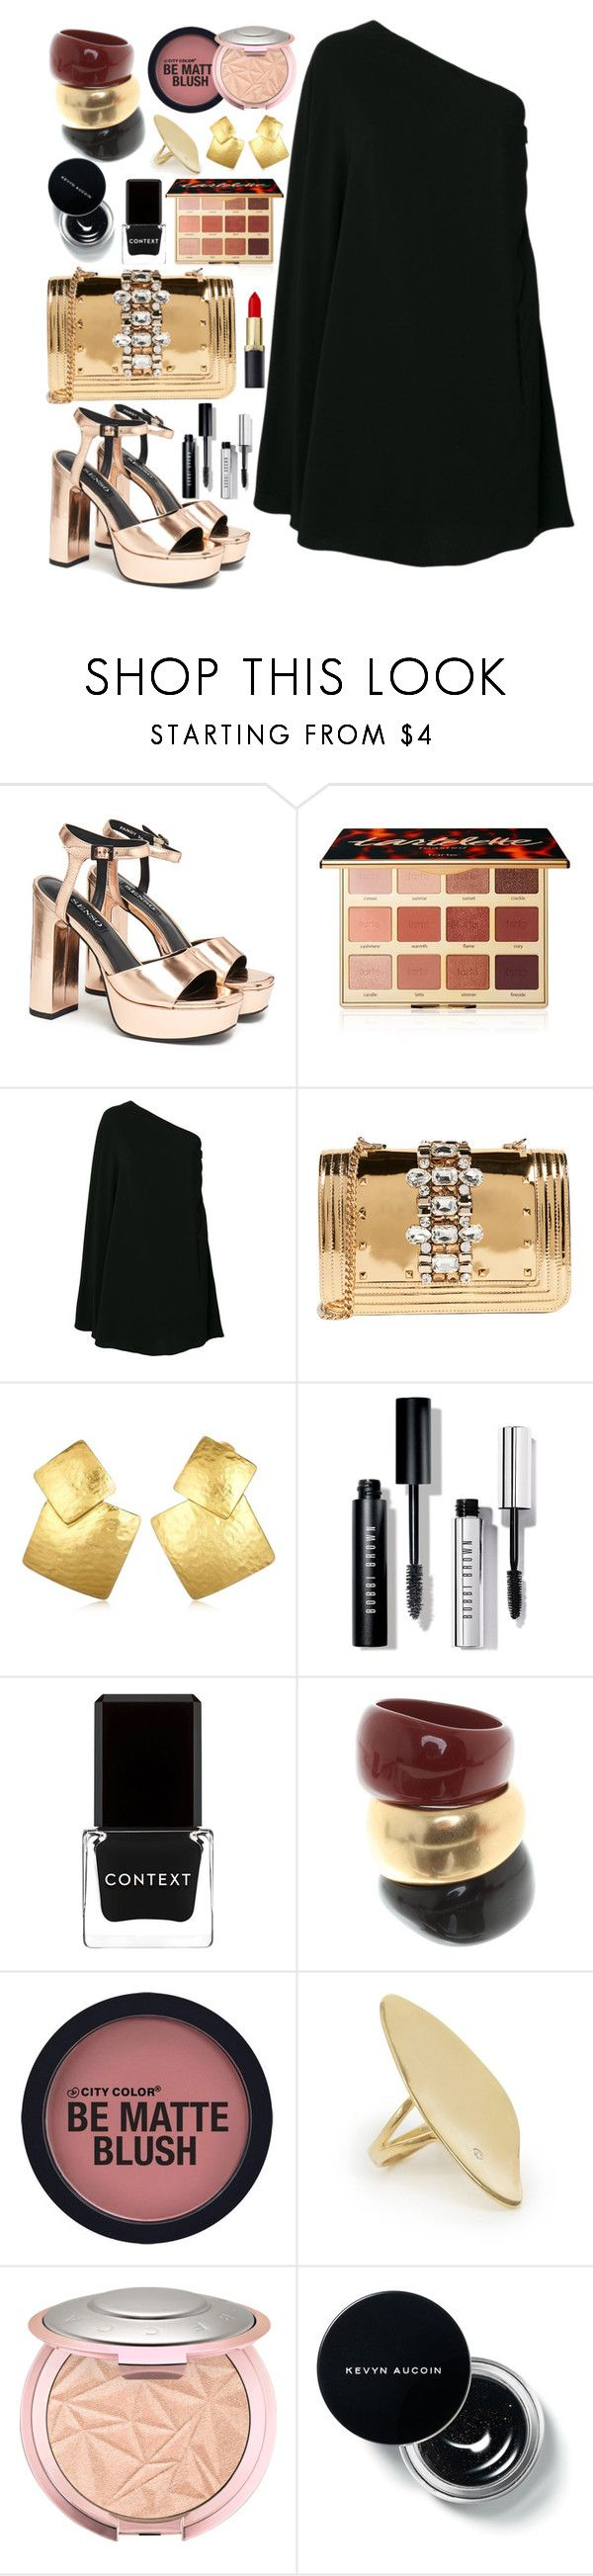 """Golden black"" by missbeatniks ❤ liked on Polyvore featuring Senso, tarte, Yves Saint Laurent, GEDEBE, Oscar de la Renta, Bobbi Brown Cosmetics, Context, Salvatore Ferragamo and Calder"